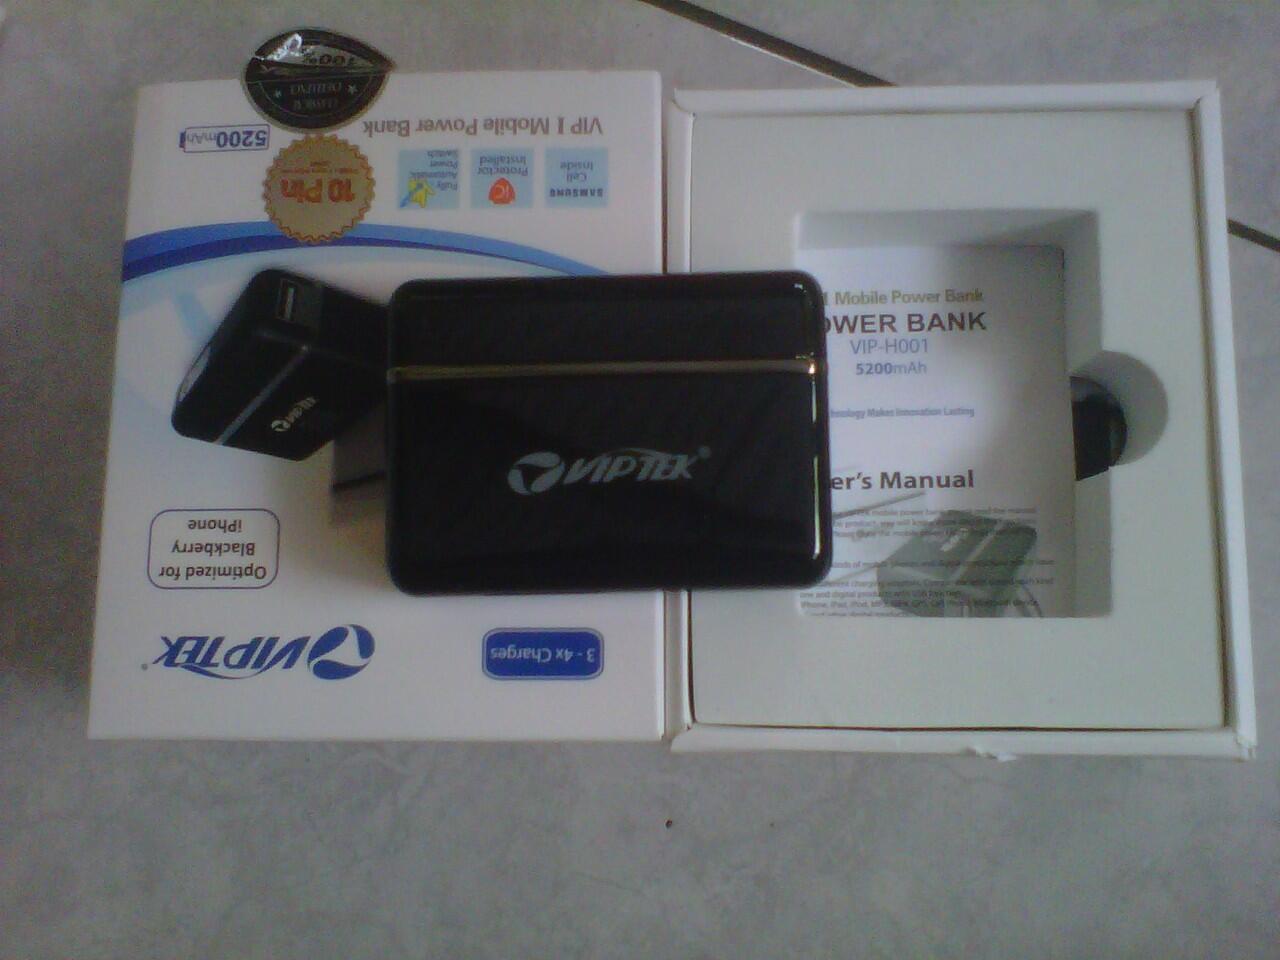 POWER BANK VIPTEK,RESSELER WELCOME......BUKAN MURAHAN!!!